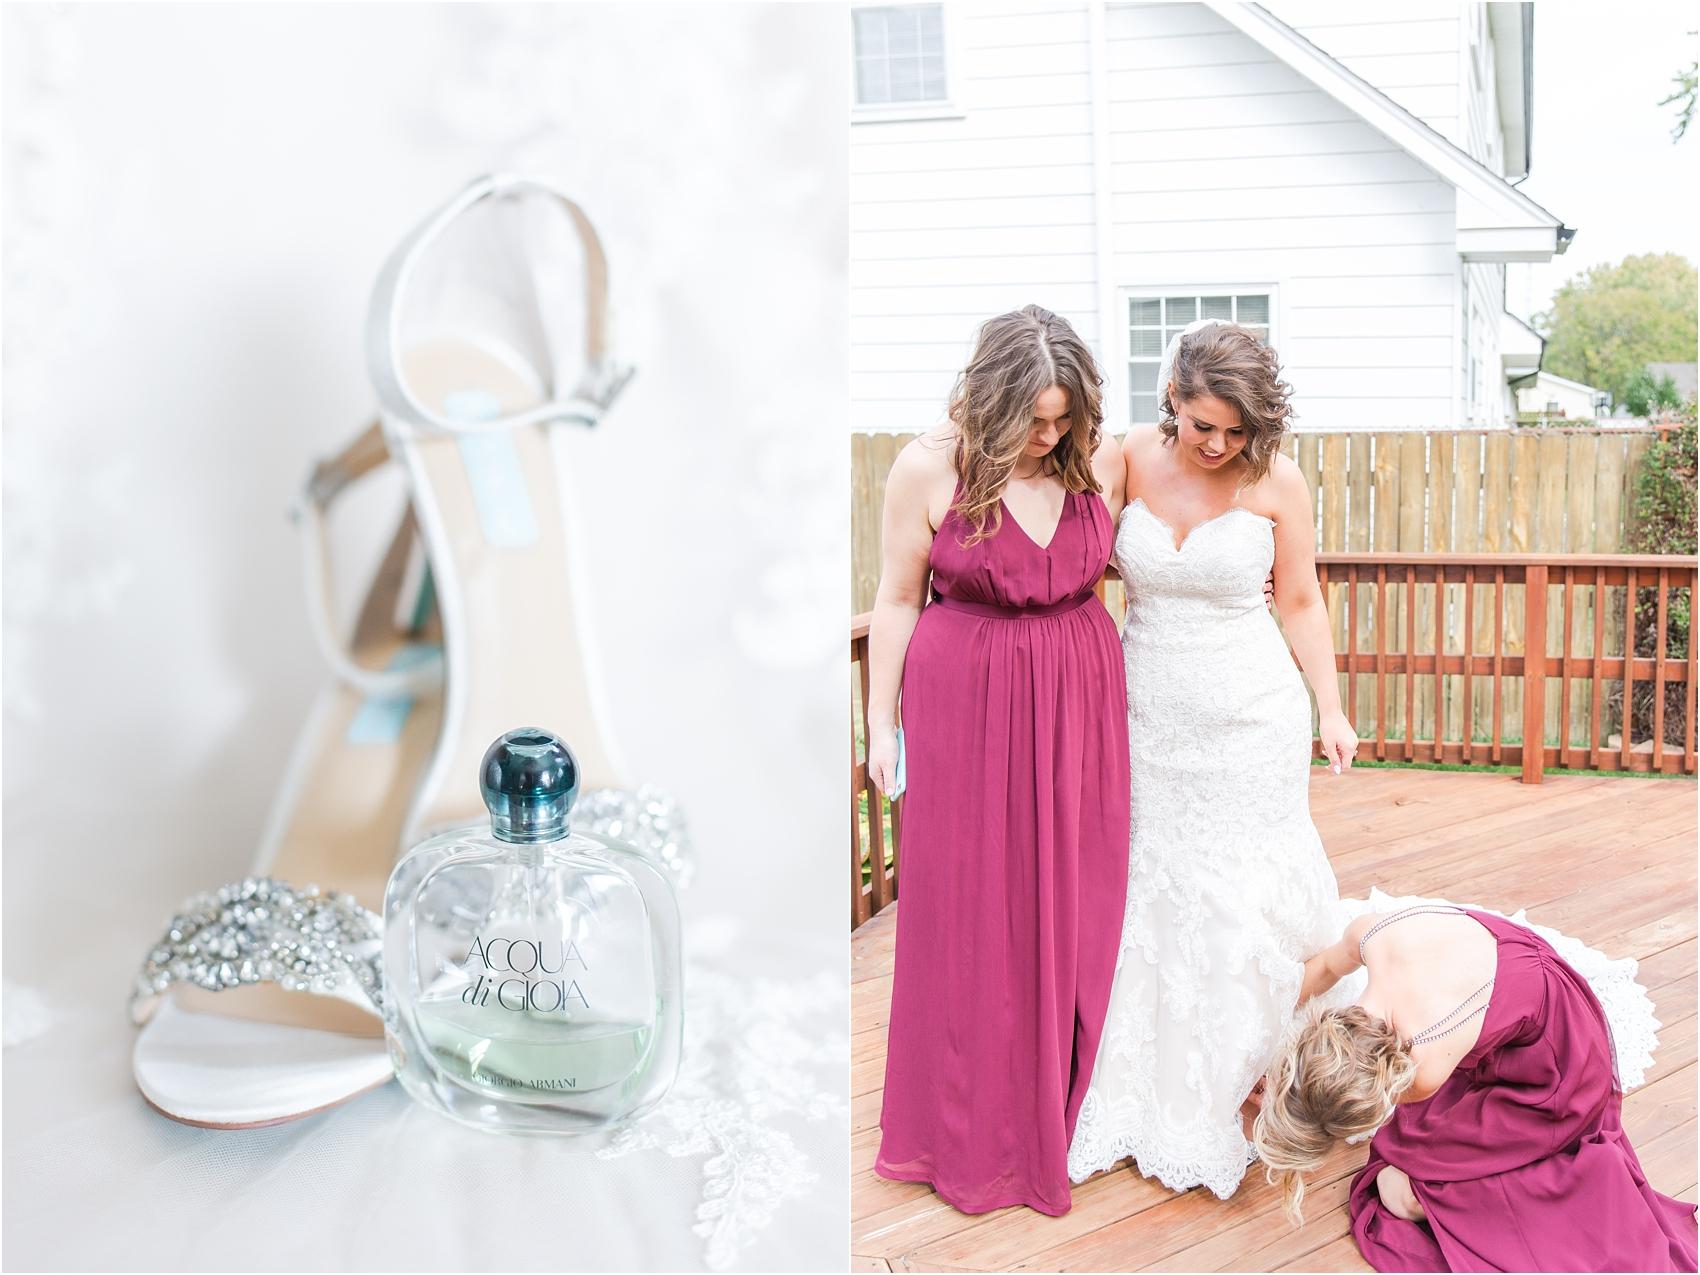 elegant-and-romantic-fall-wedding-photos-at-st-marys-catholic-church-in-monroe-michigan-by-courtney-carolyn-photography_0009.jpg